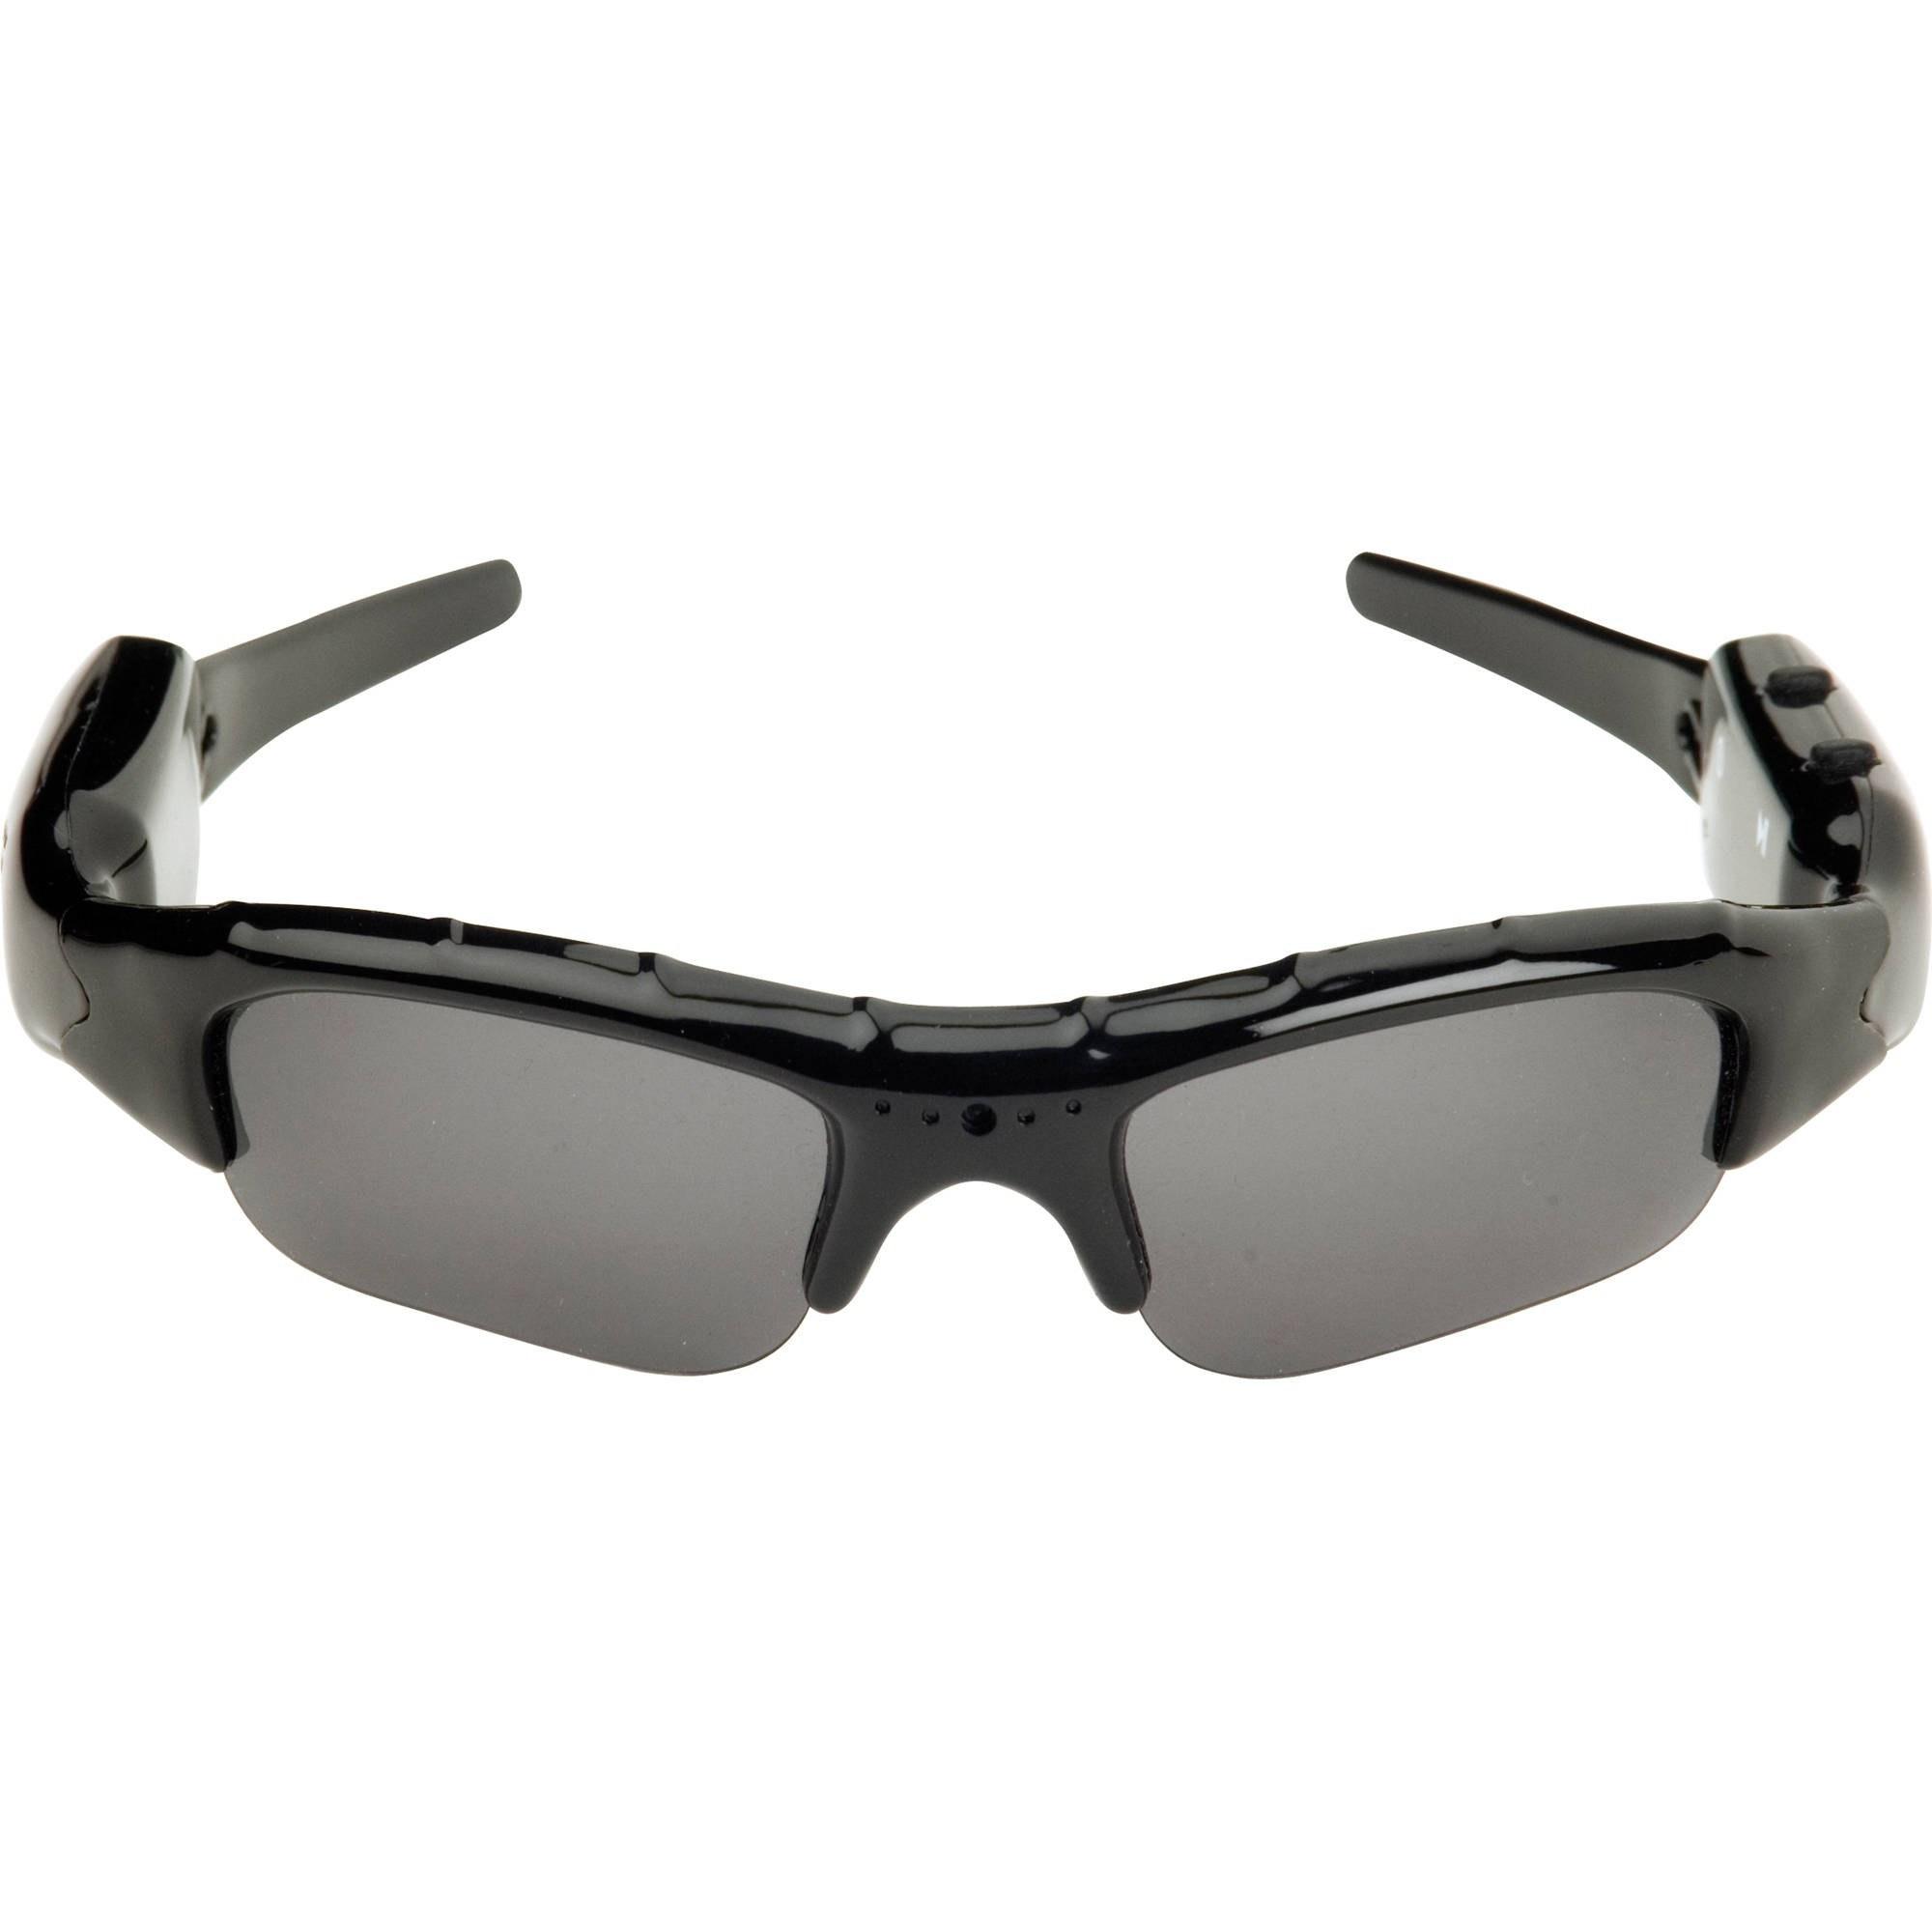 تصویر عینک دوربین دار طرح : آفتابی